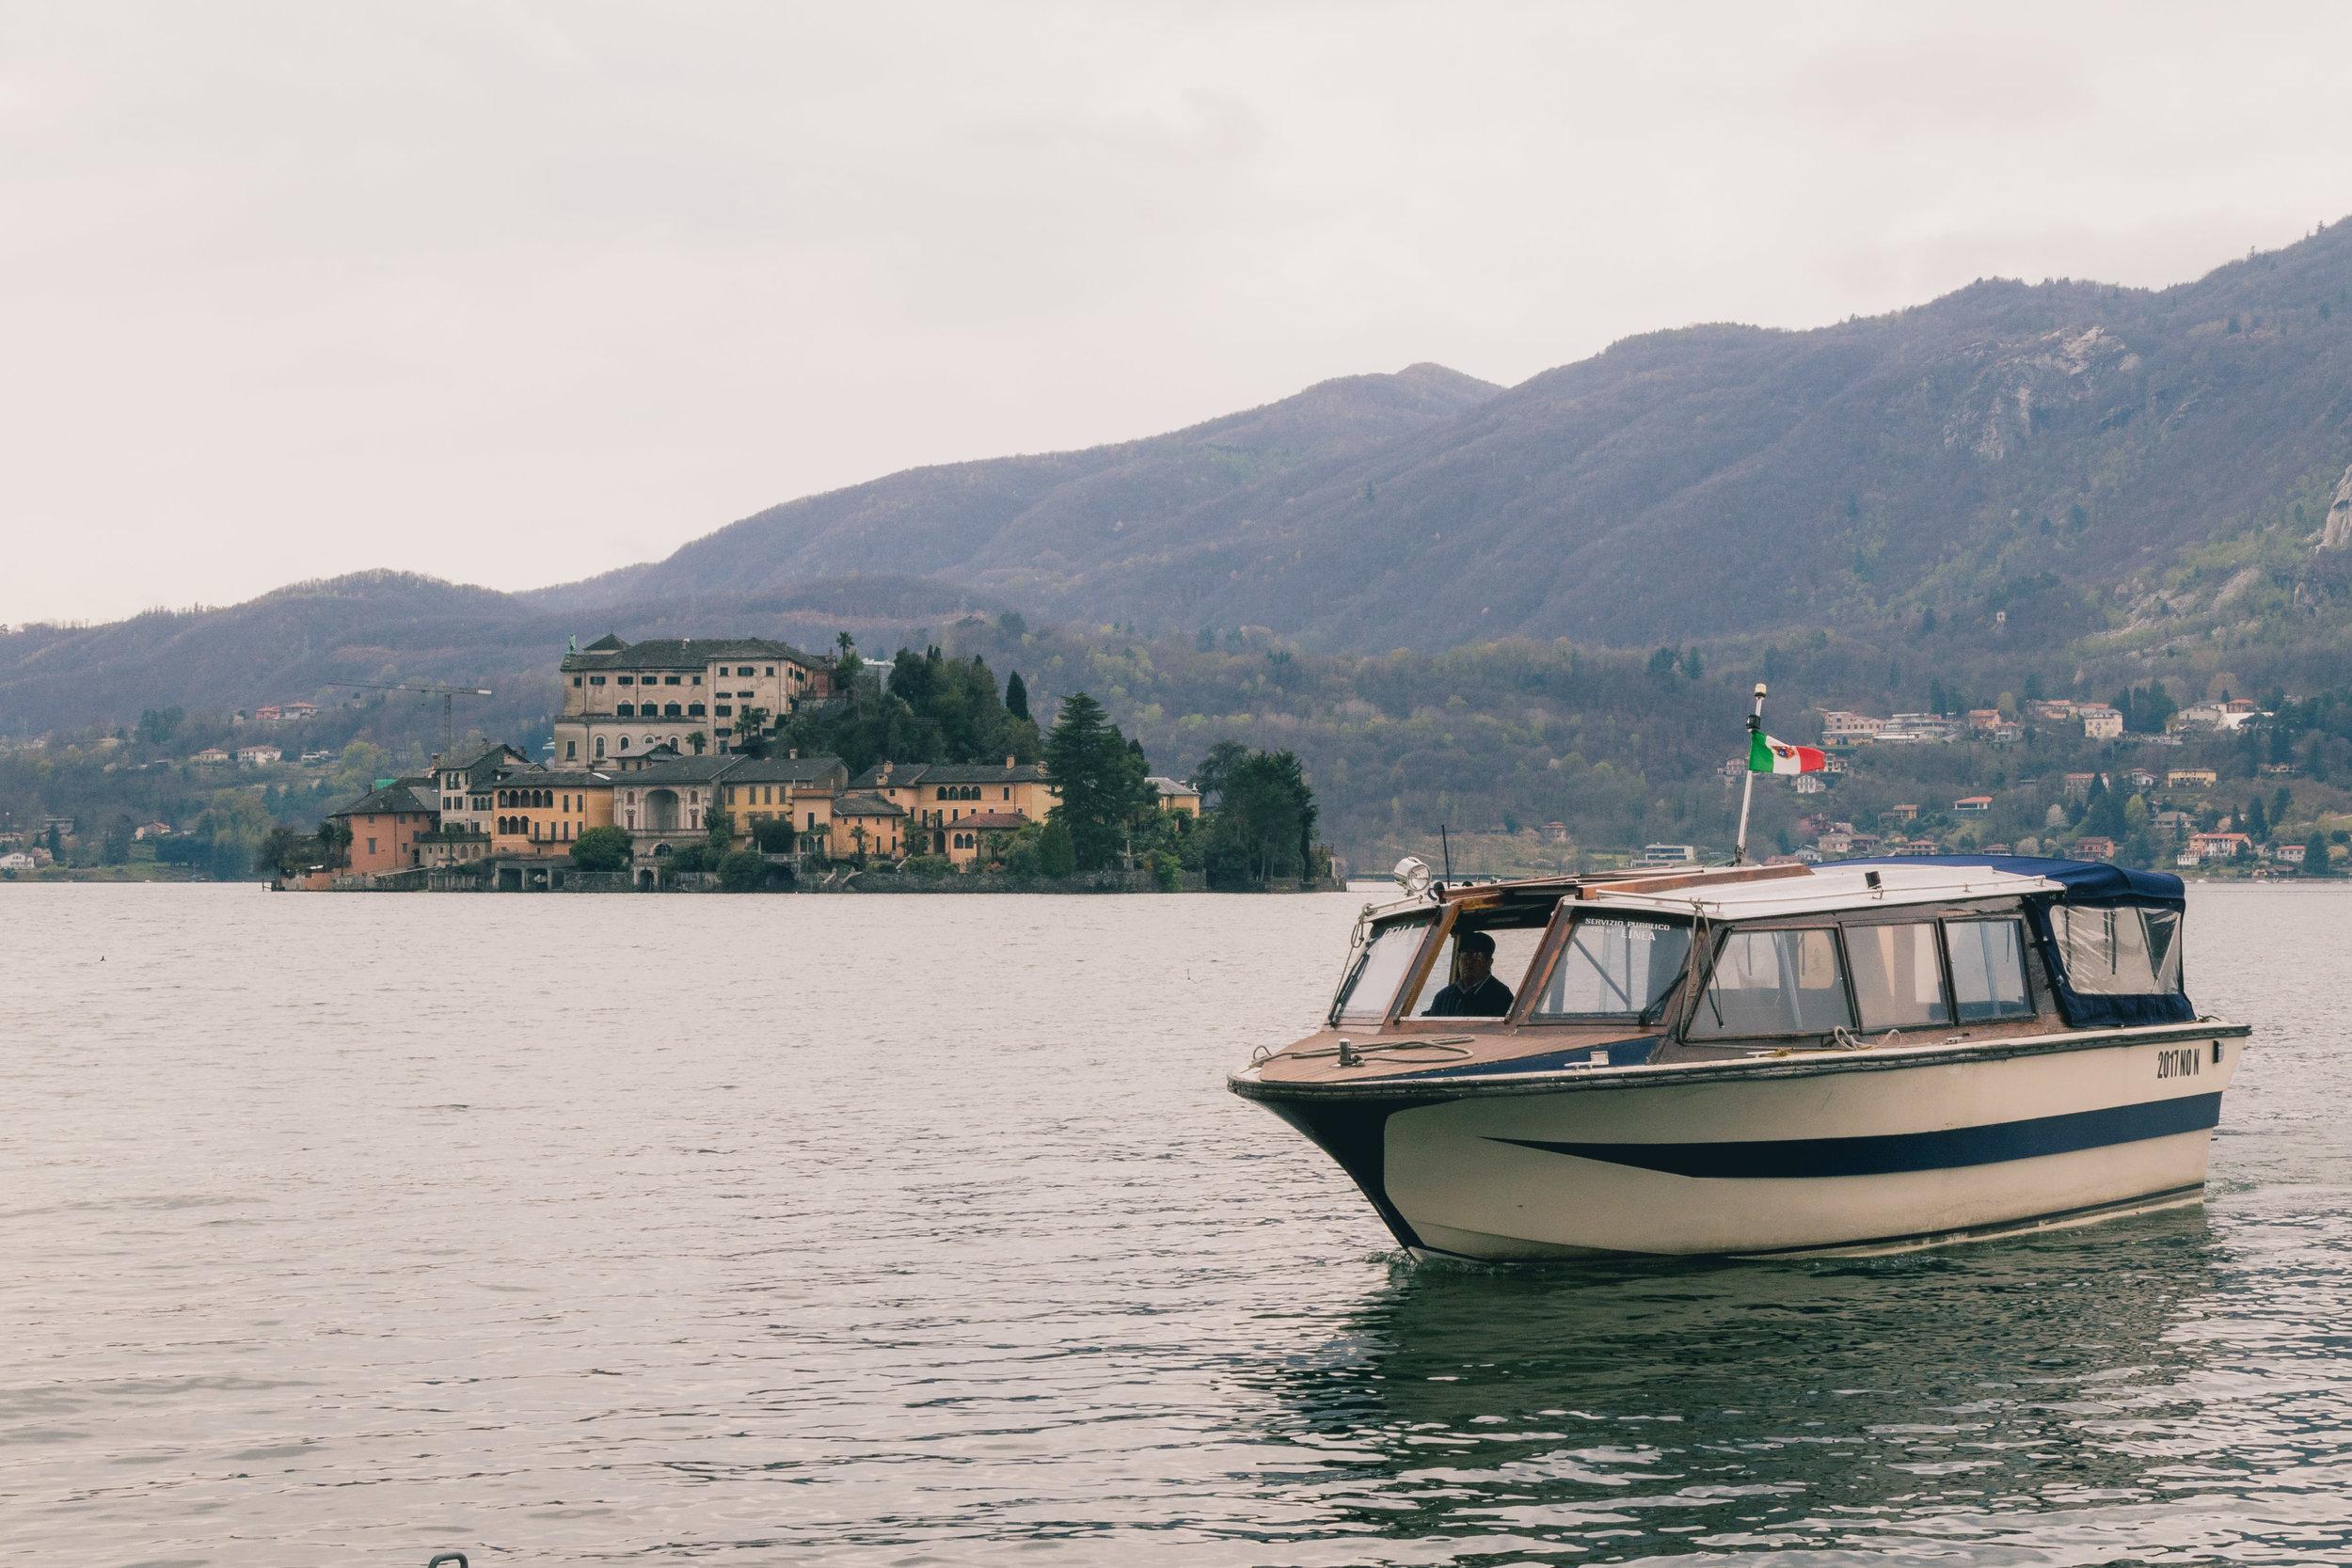 Lake_Orta_Fantini_day1-5.jpg